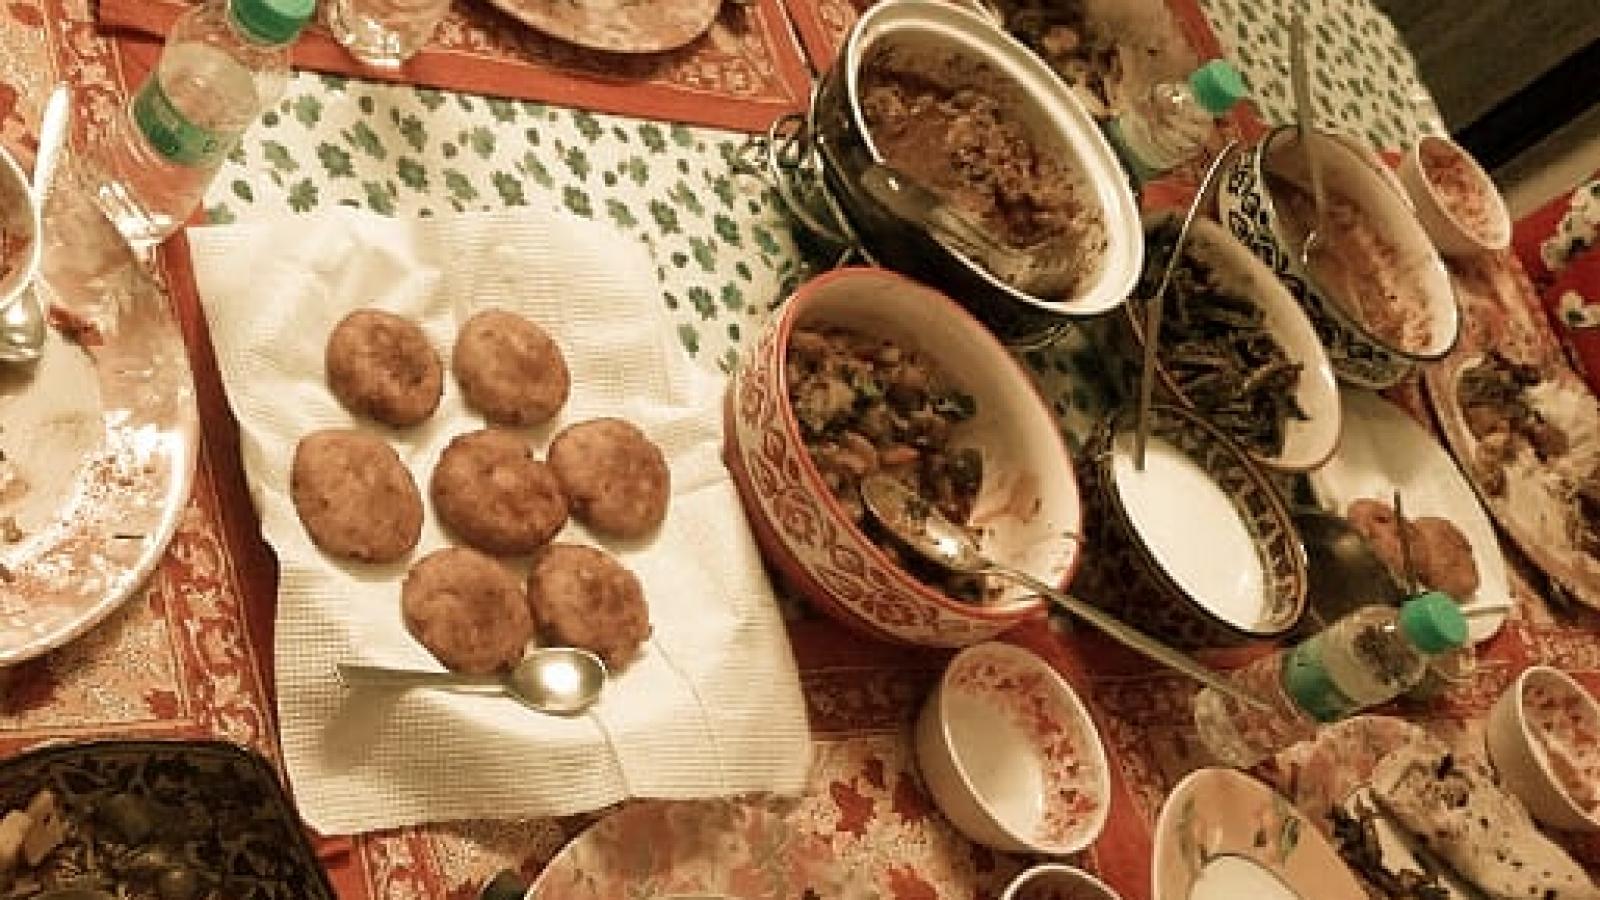 jaipur-activity-food-private-dinner-square